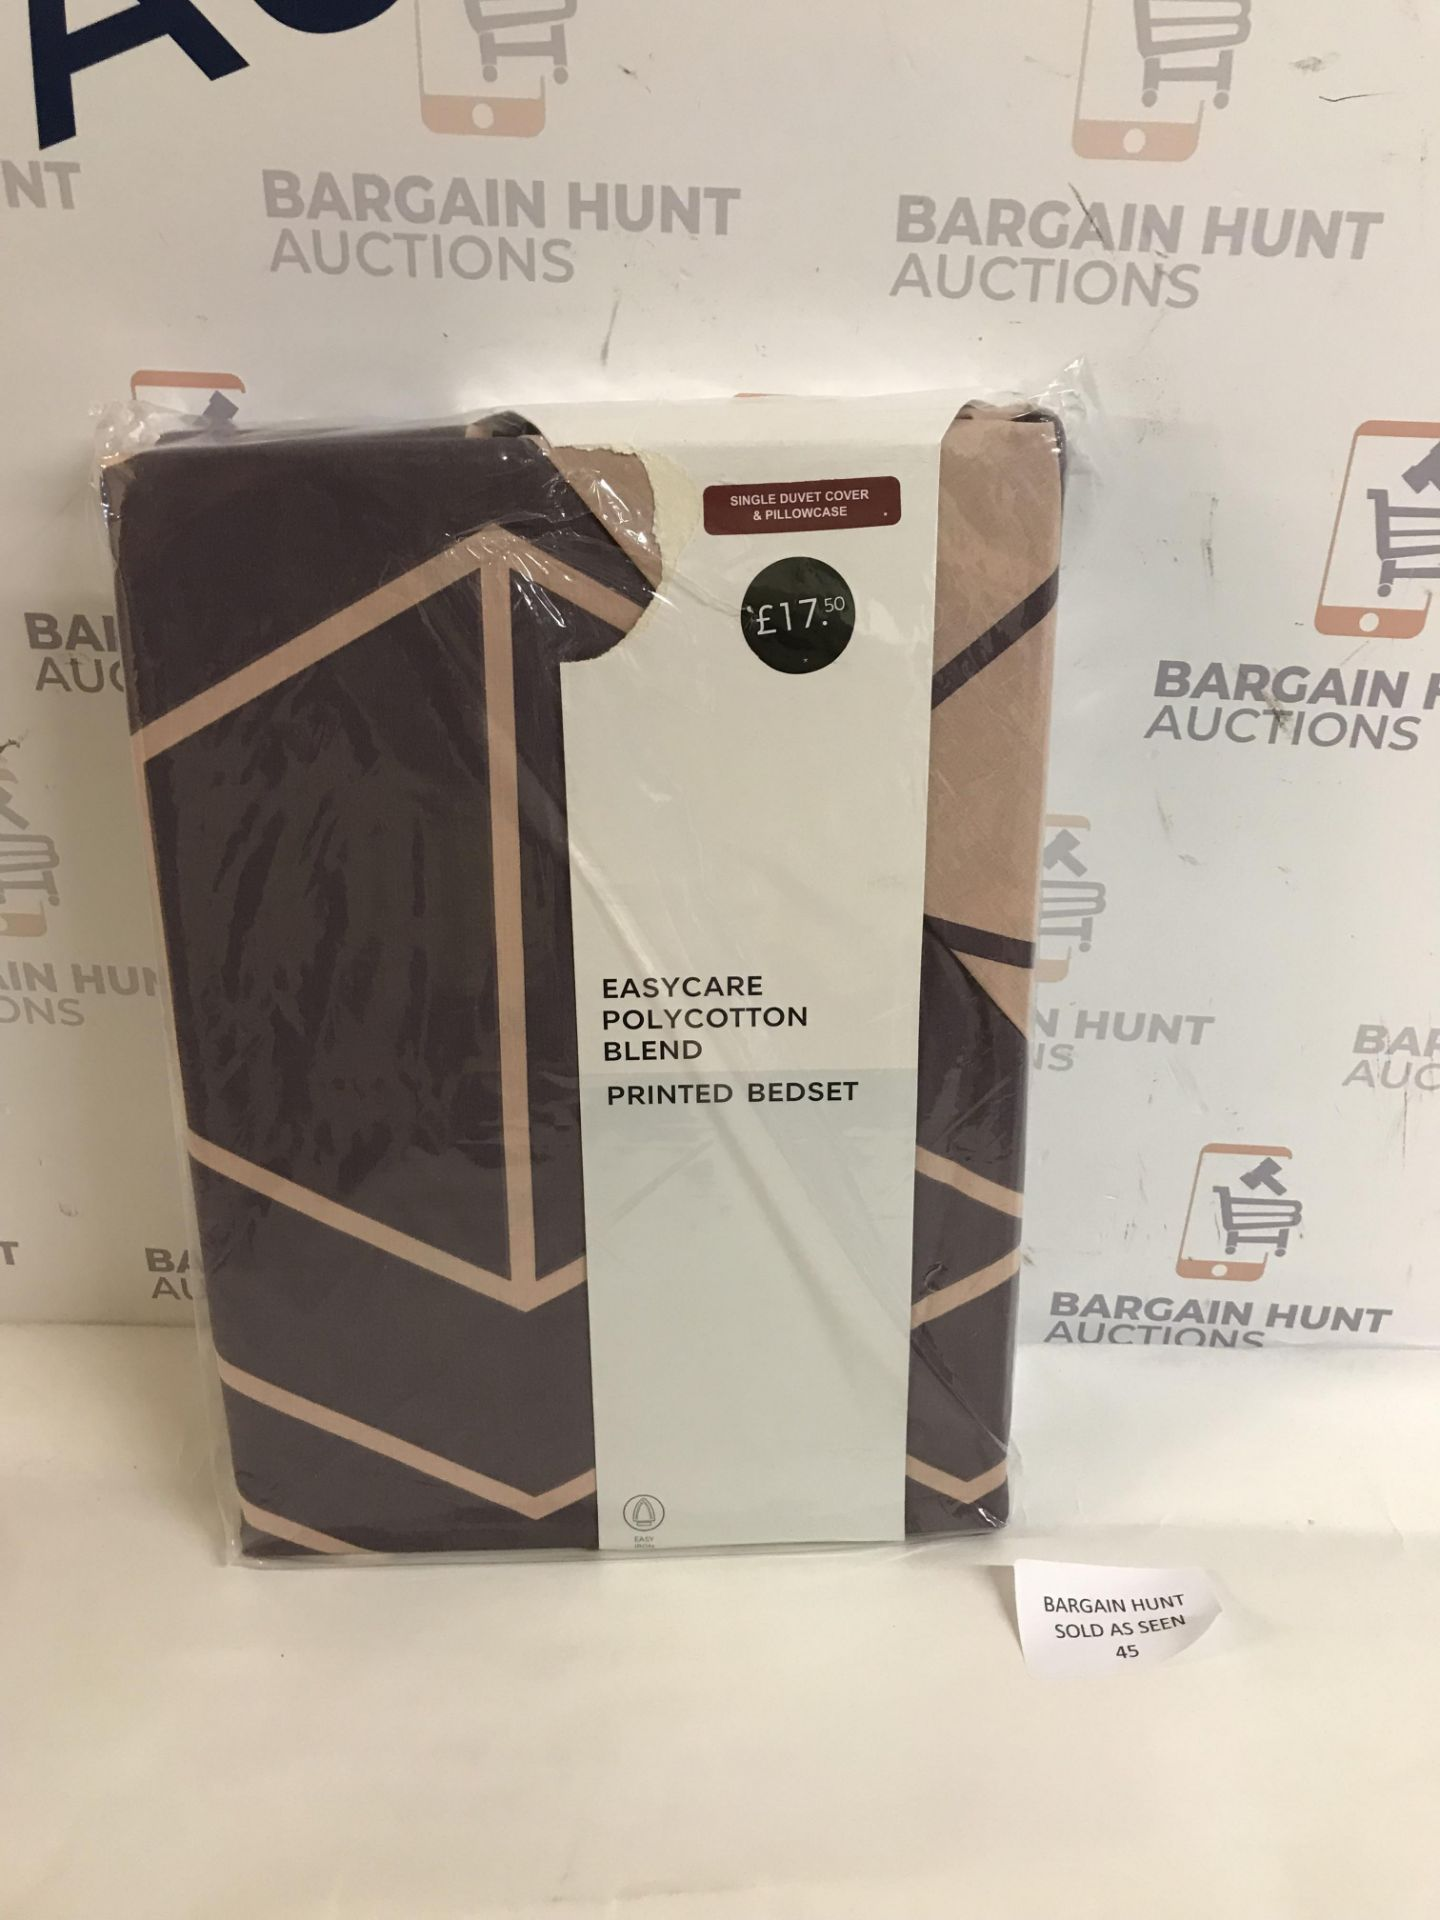 Lot 45 - Easycare Polycotton Blend Printed Bedding Set, Single